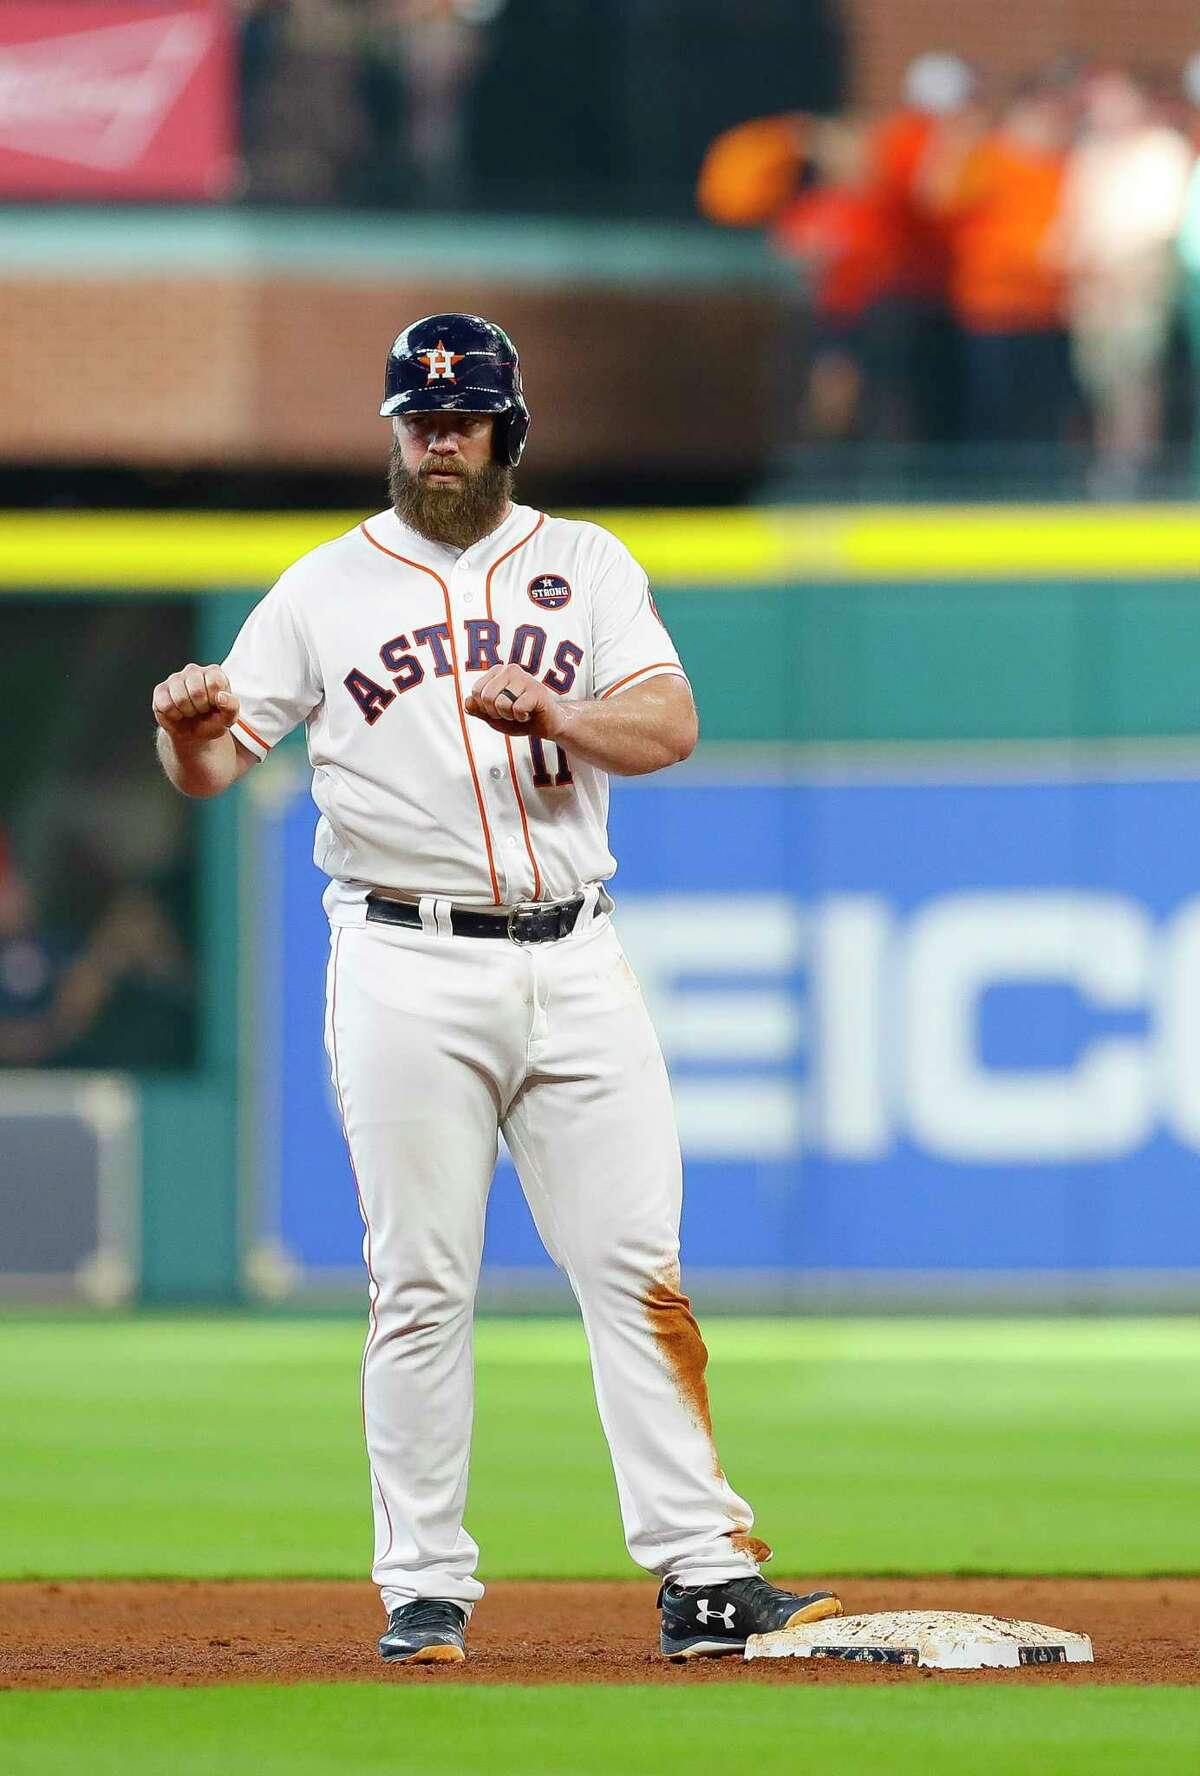 Astros catcher Evan Gattis is the designated hitter for Monday's ALDS game in Boston.